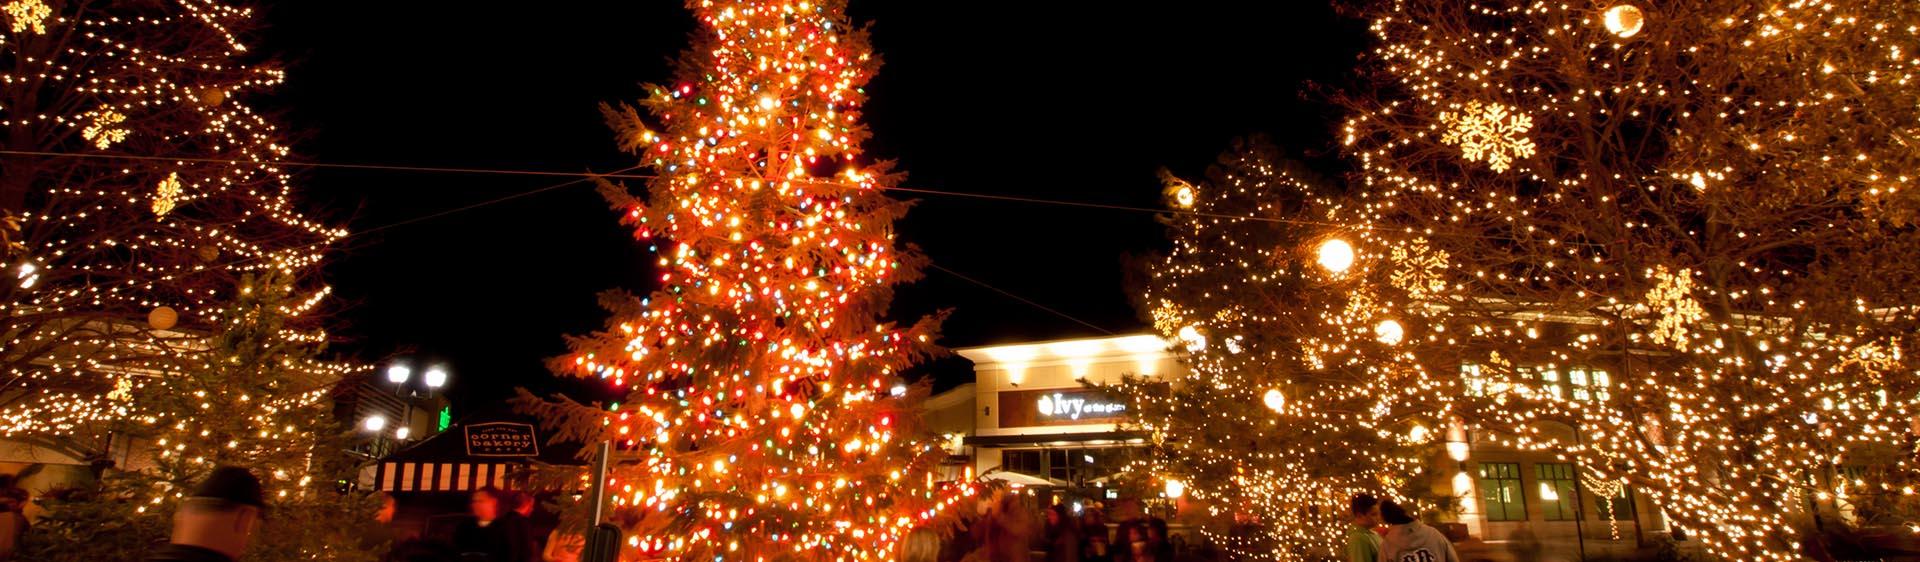 Cochrane Christmas Light Installation, Christmas Light Company and Holiday Lighting Installation